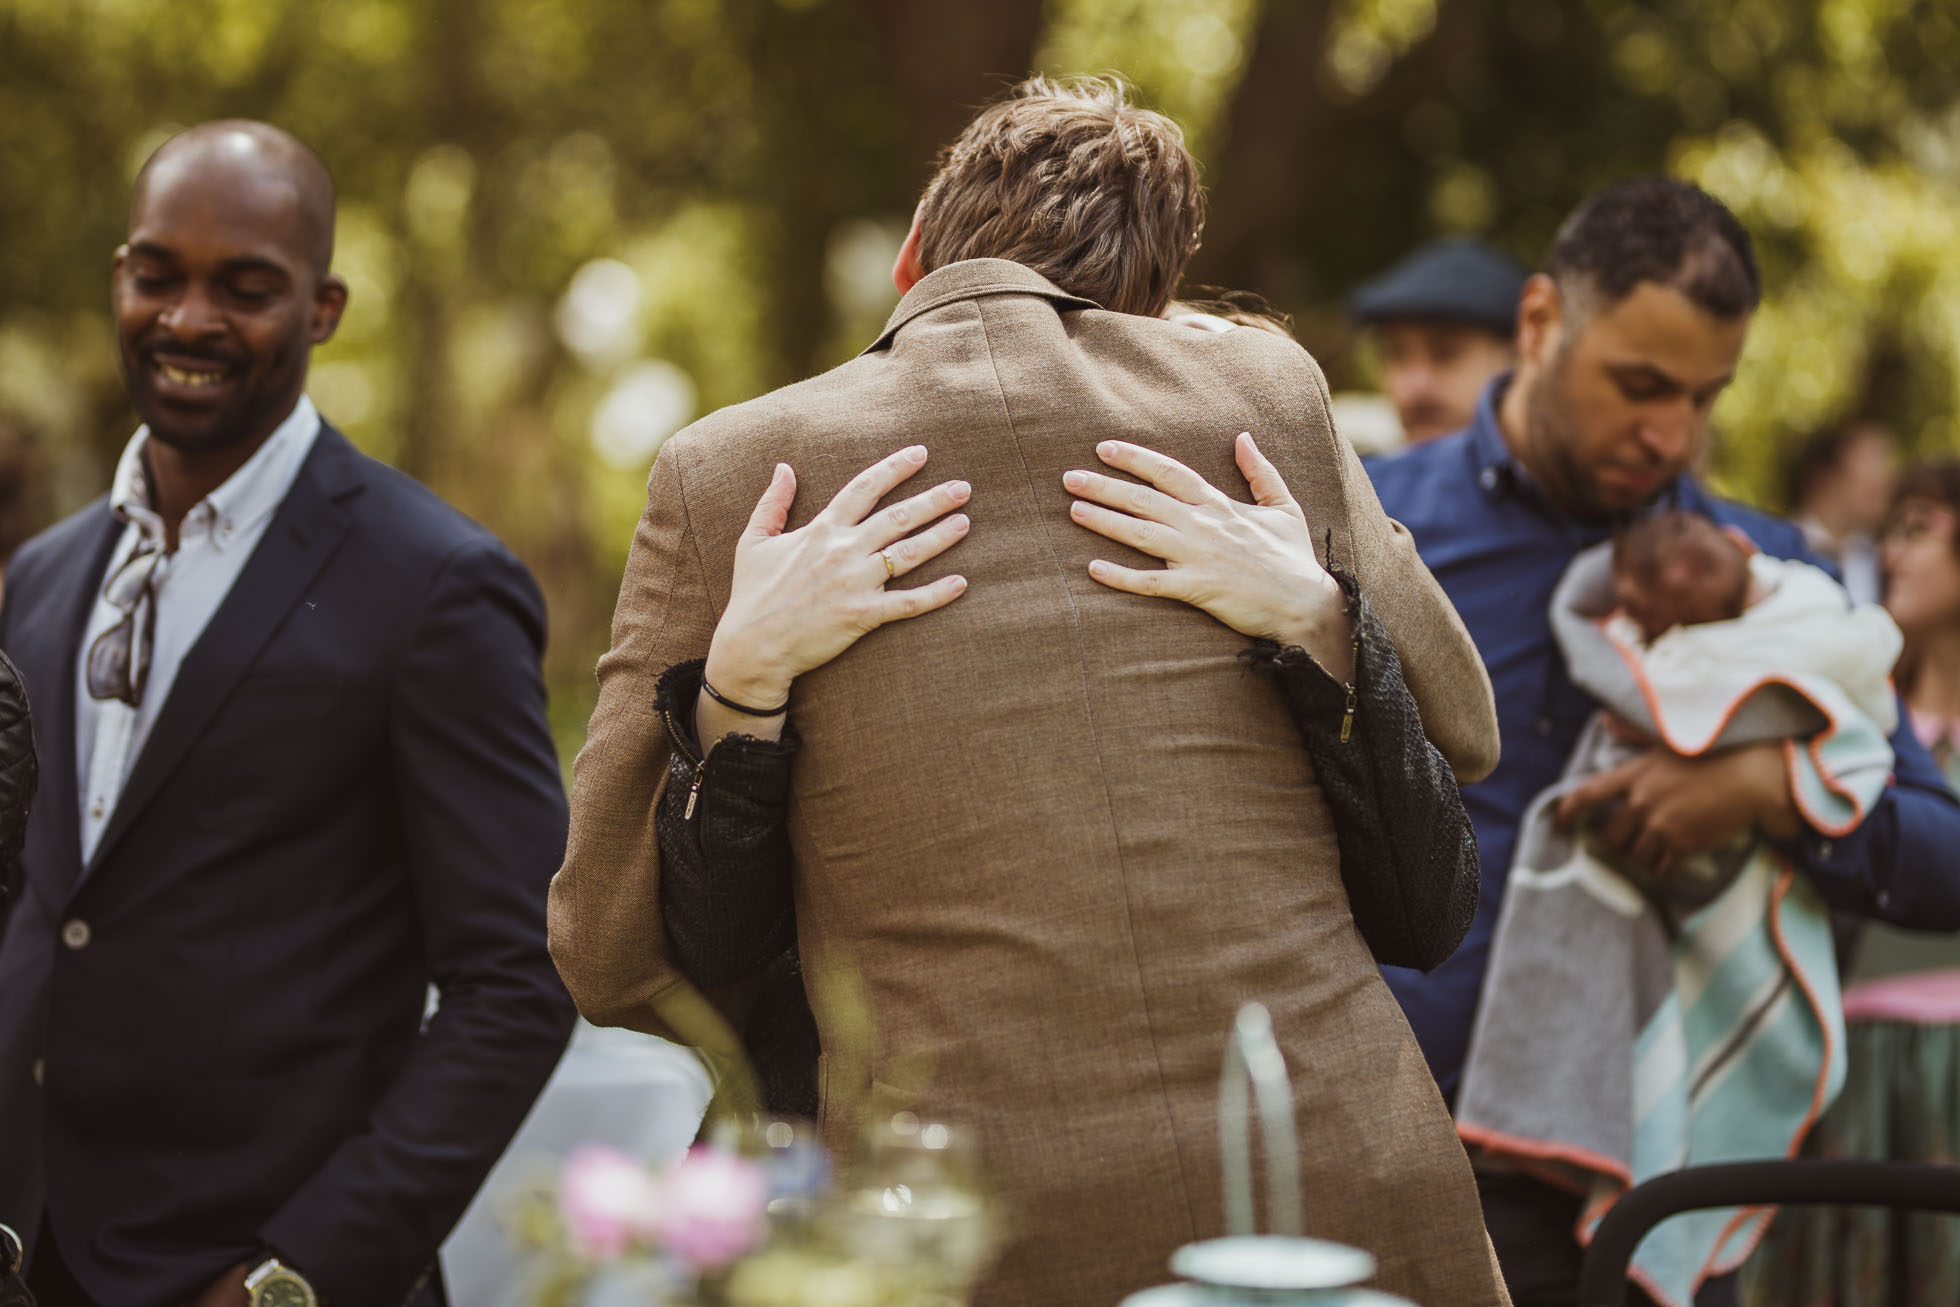 utrecht-wedding-photographer-79.jpg